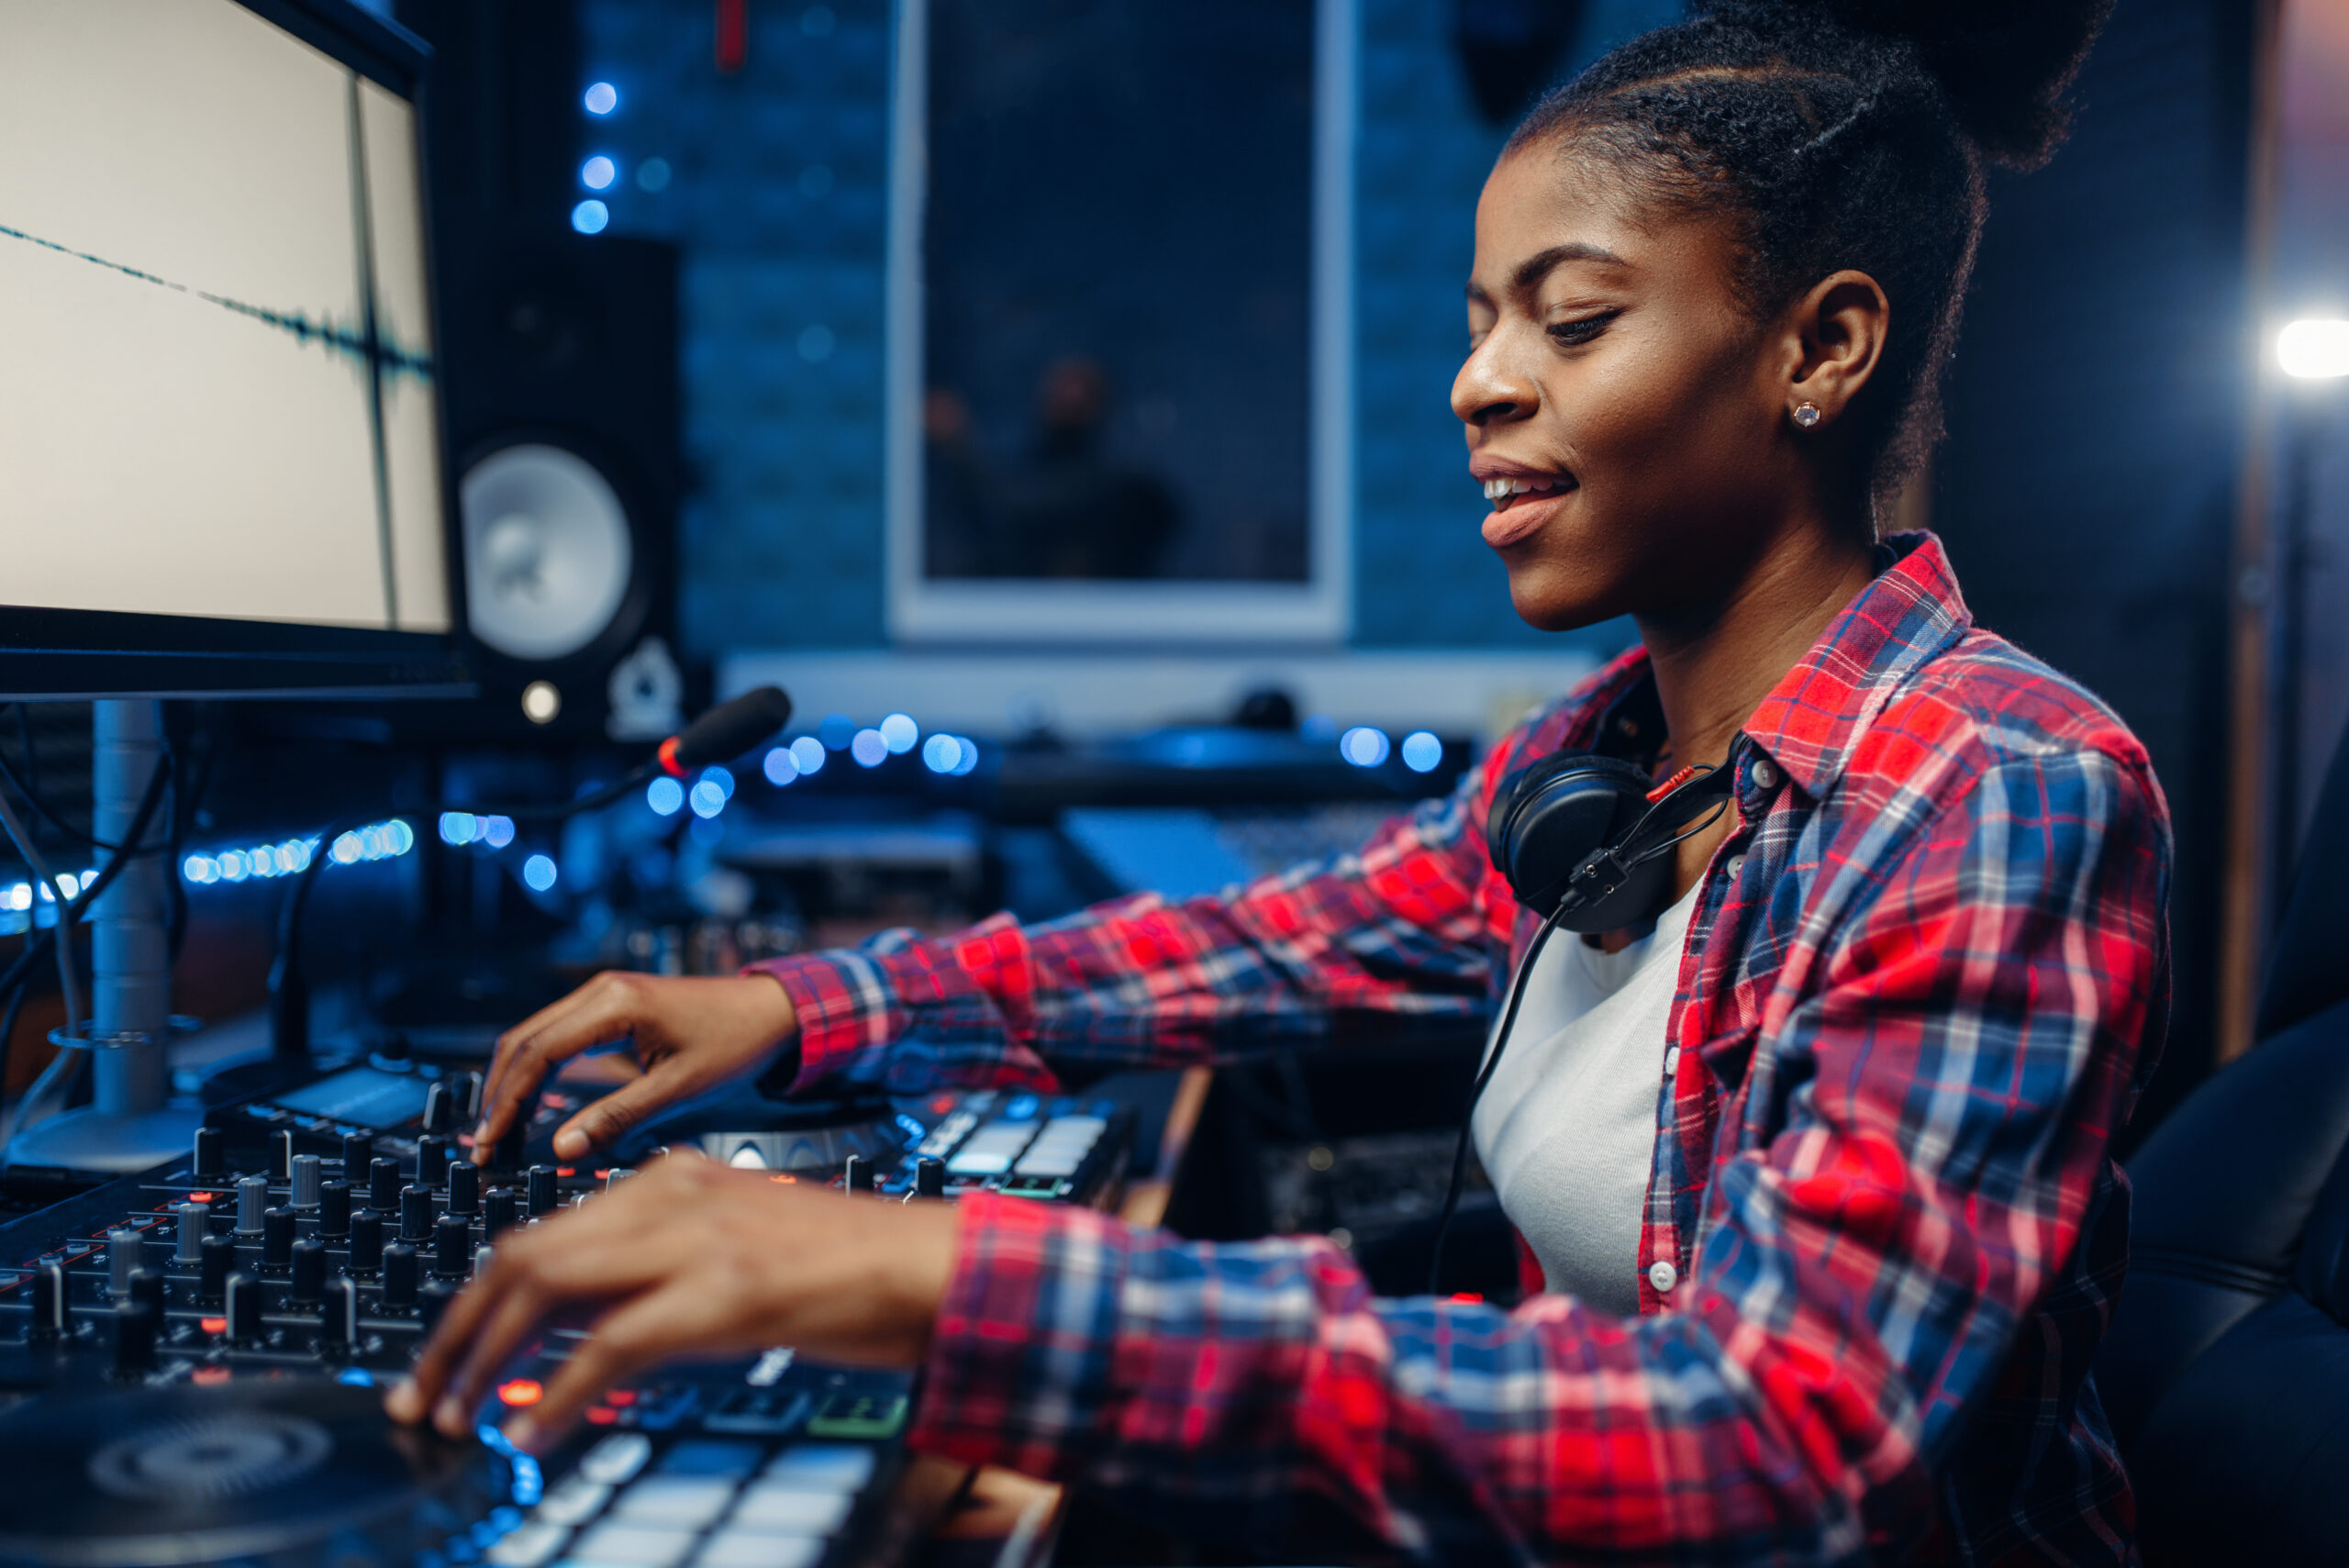 Woman recording in the studio